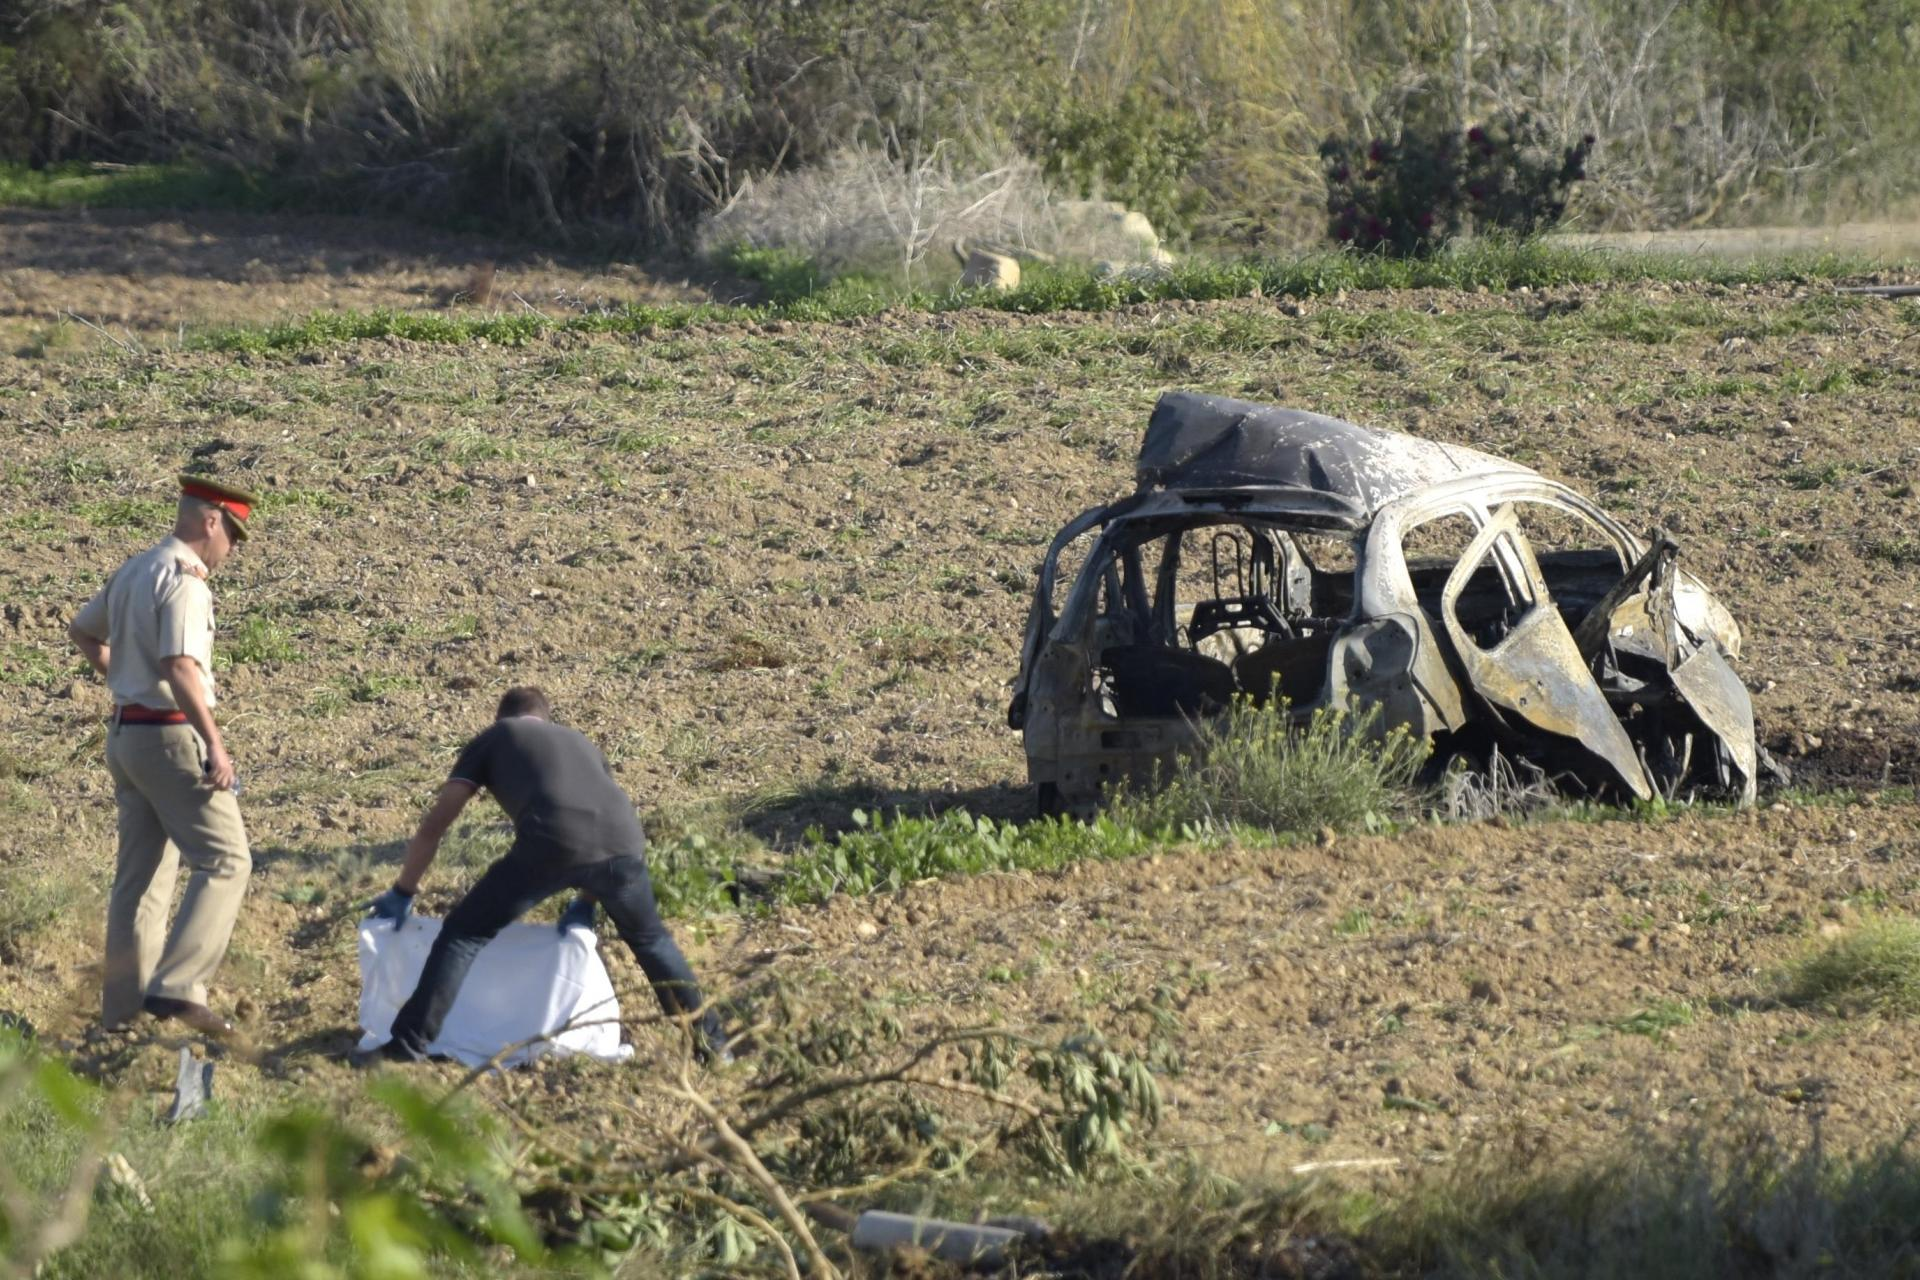 The burnt wreck of Caruana Galizia's car at the murder scene in October 2017. Photo: Mark Zammit Cordina